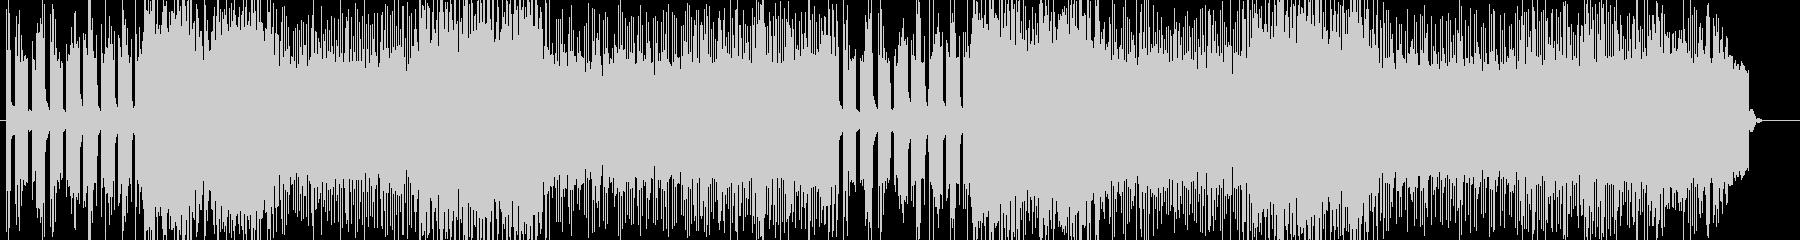 「HR/HM」「SLASH」BGM172の未再生の波形